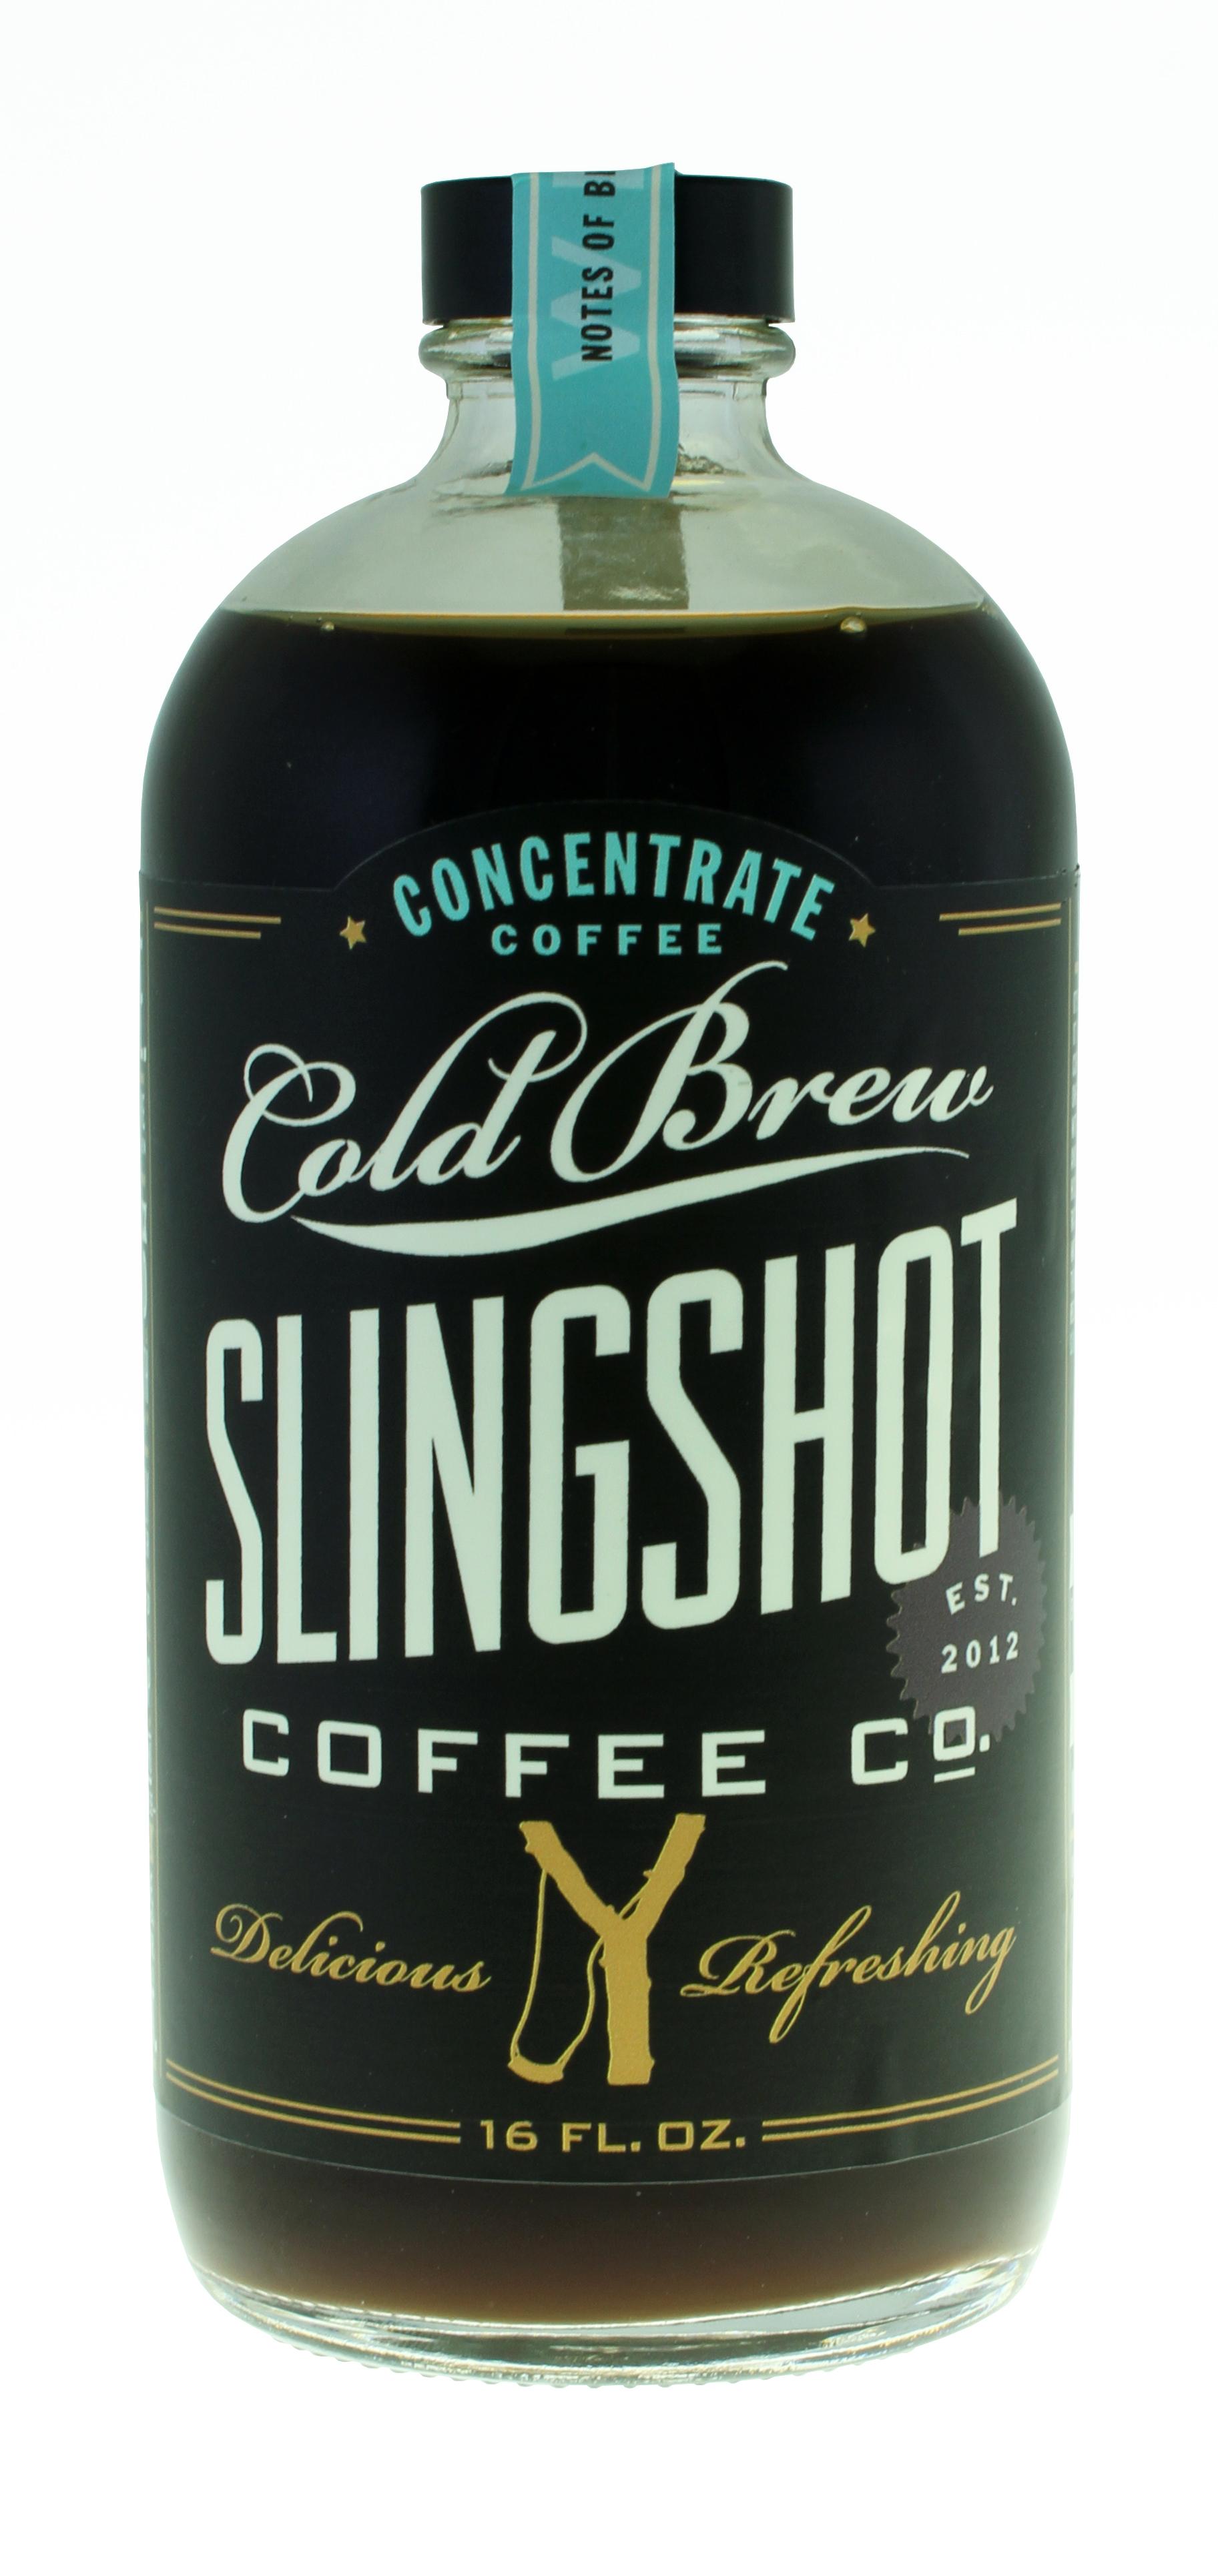 Slingshot Coffee Co.: